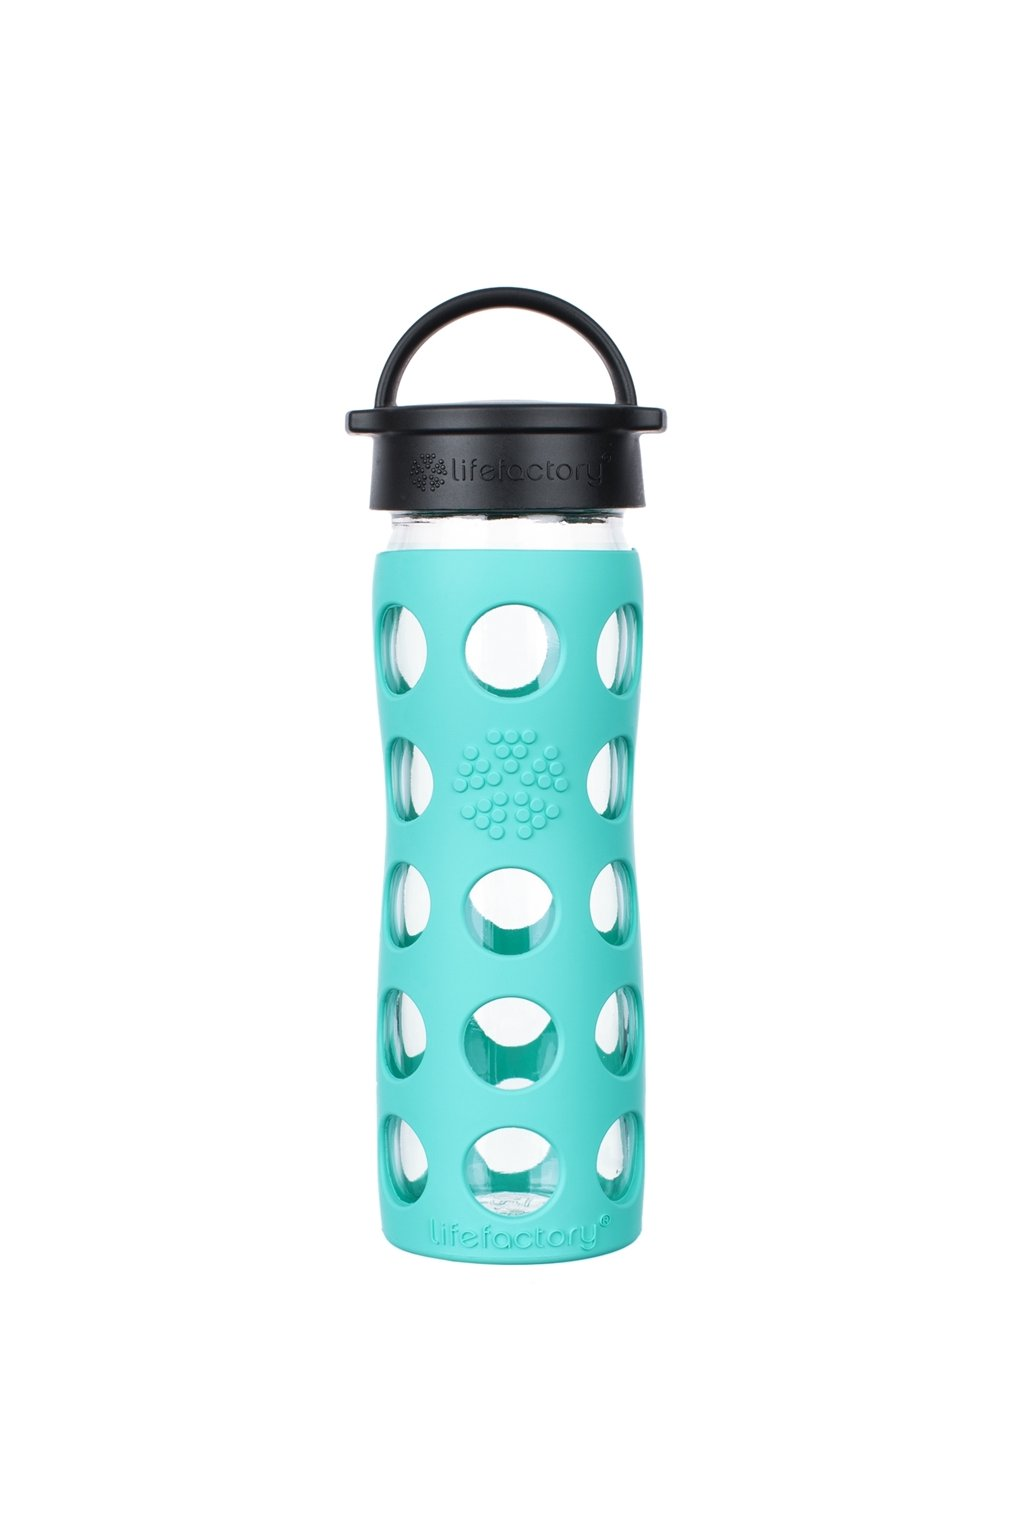 Lifefactory sklenena lahev na vodu 475 ml sea green